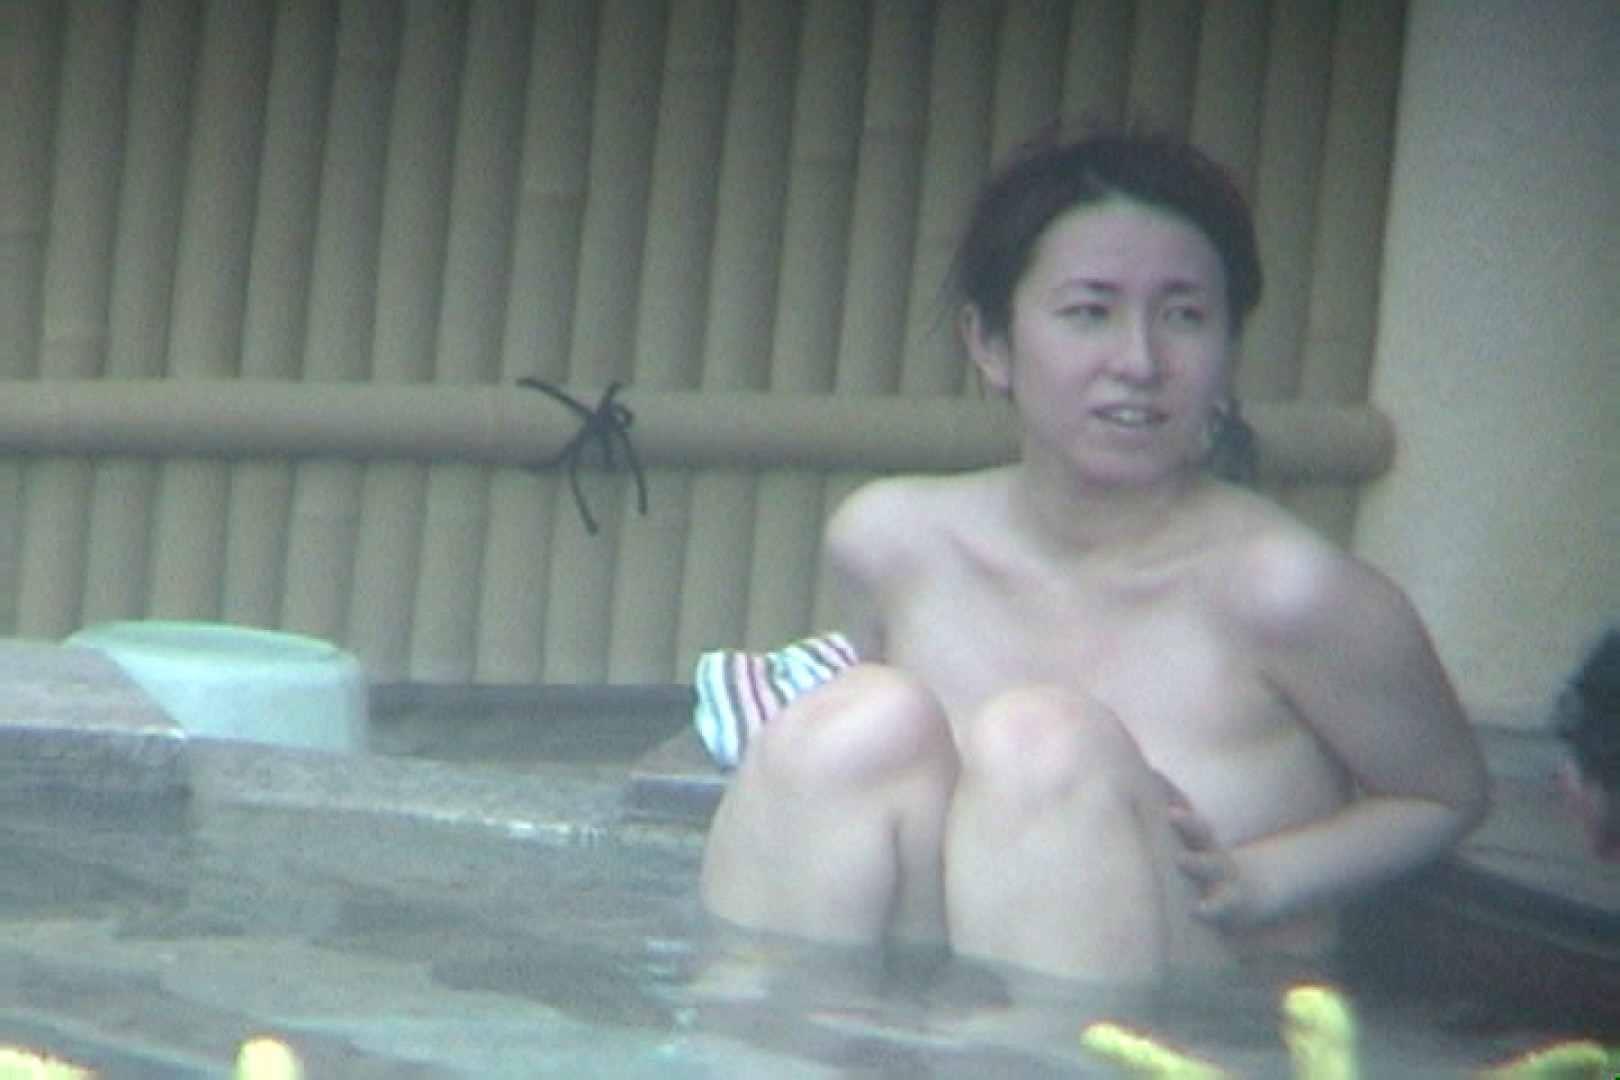 Aquaな露天風呂Vol.106 盗撮シリーズ | 露天風呂編  86PIX 43